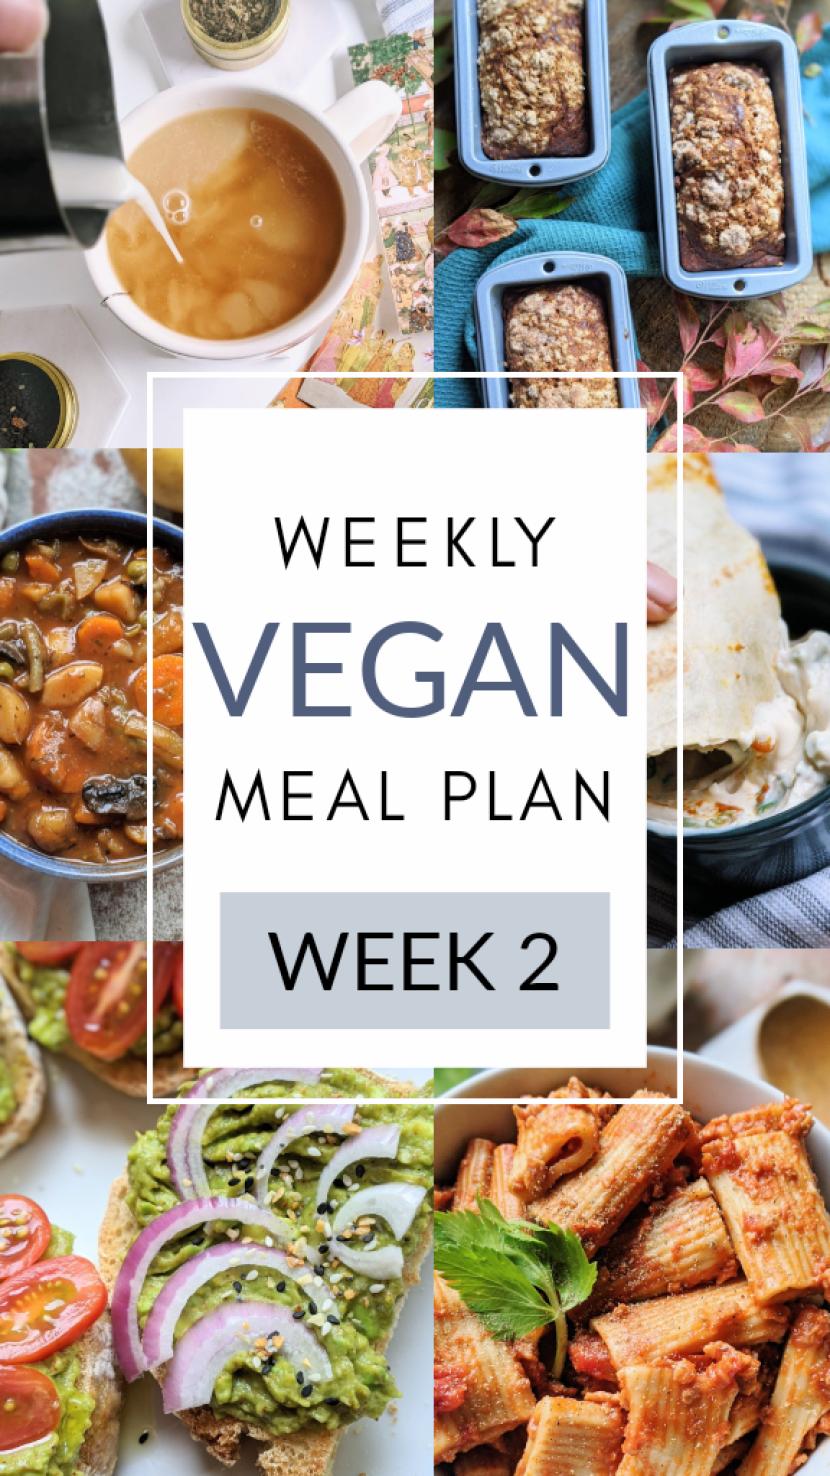 vegan meal plan for week or month healthy easy meal prep guide for vegans veganuary new vegan meal planning easy simple inexpensive cheap recipe ideas for vegans vegetarians weekly